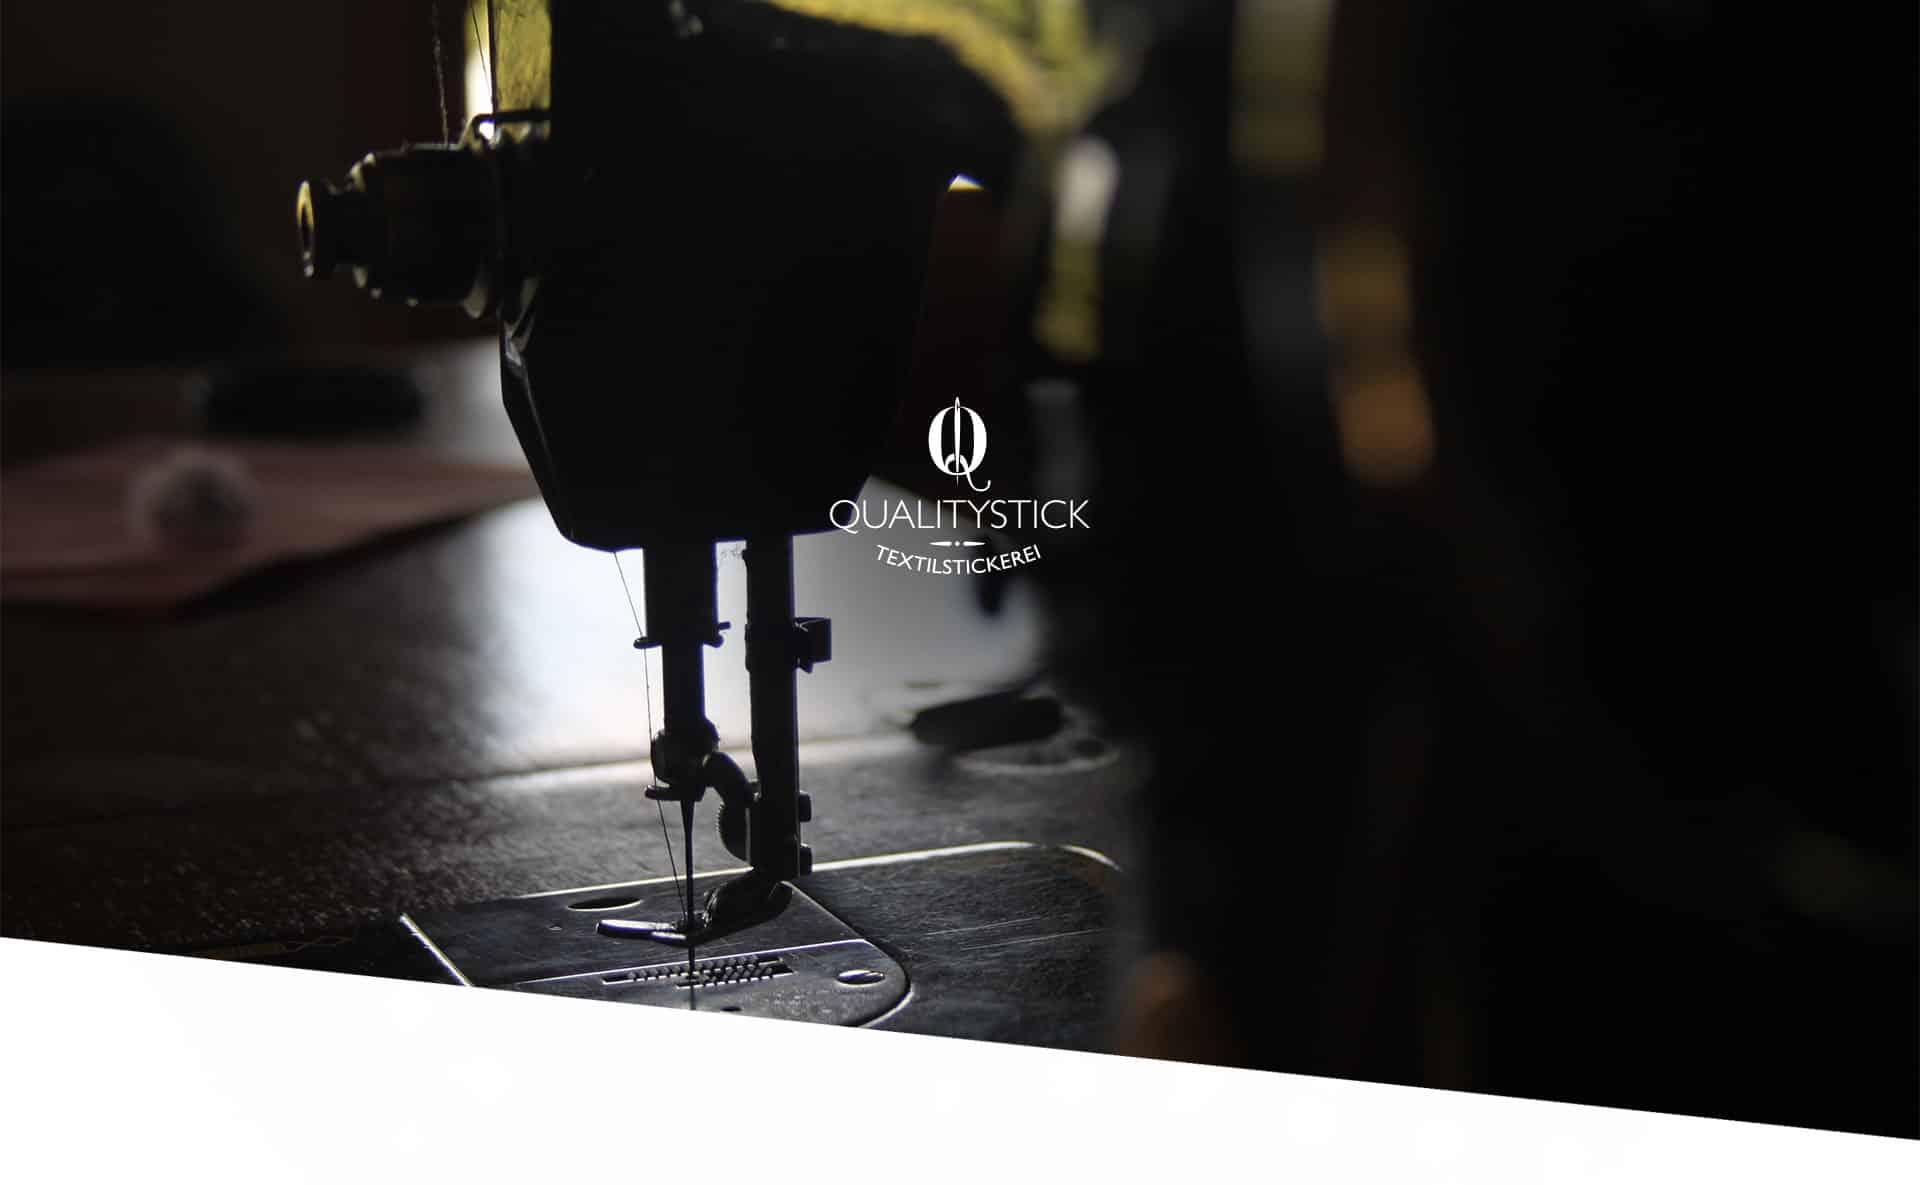 EAZEE Werbeagentur Qualitystick Logopraesentation